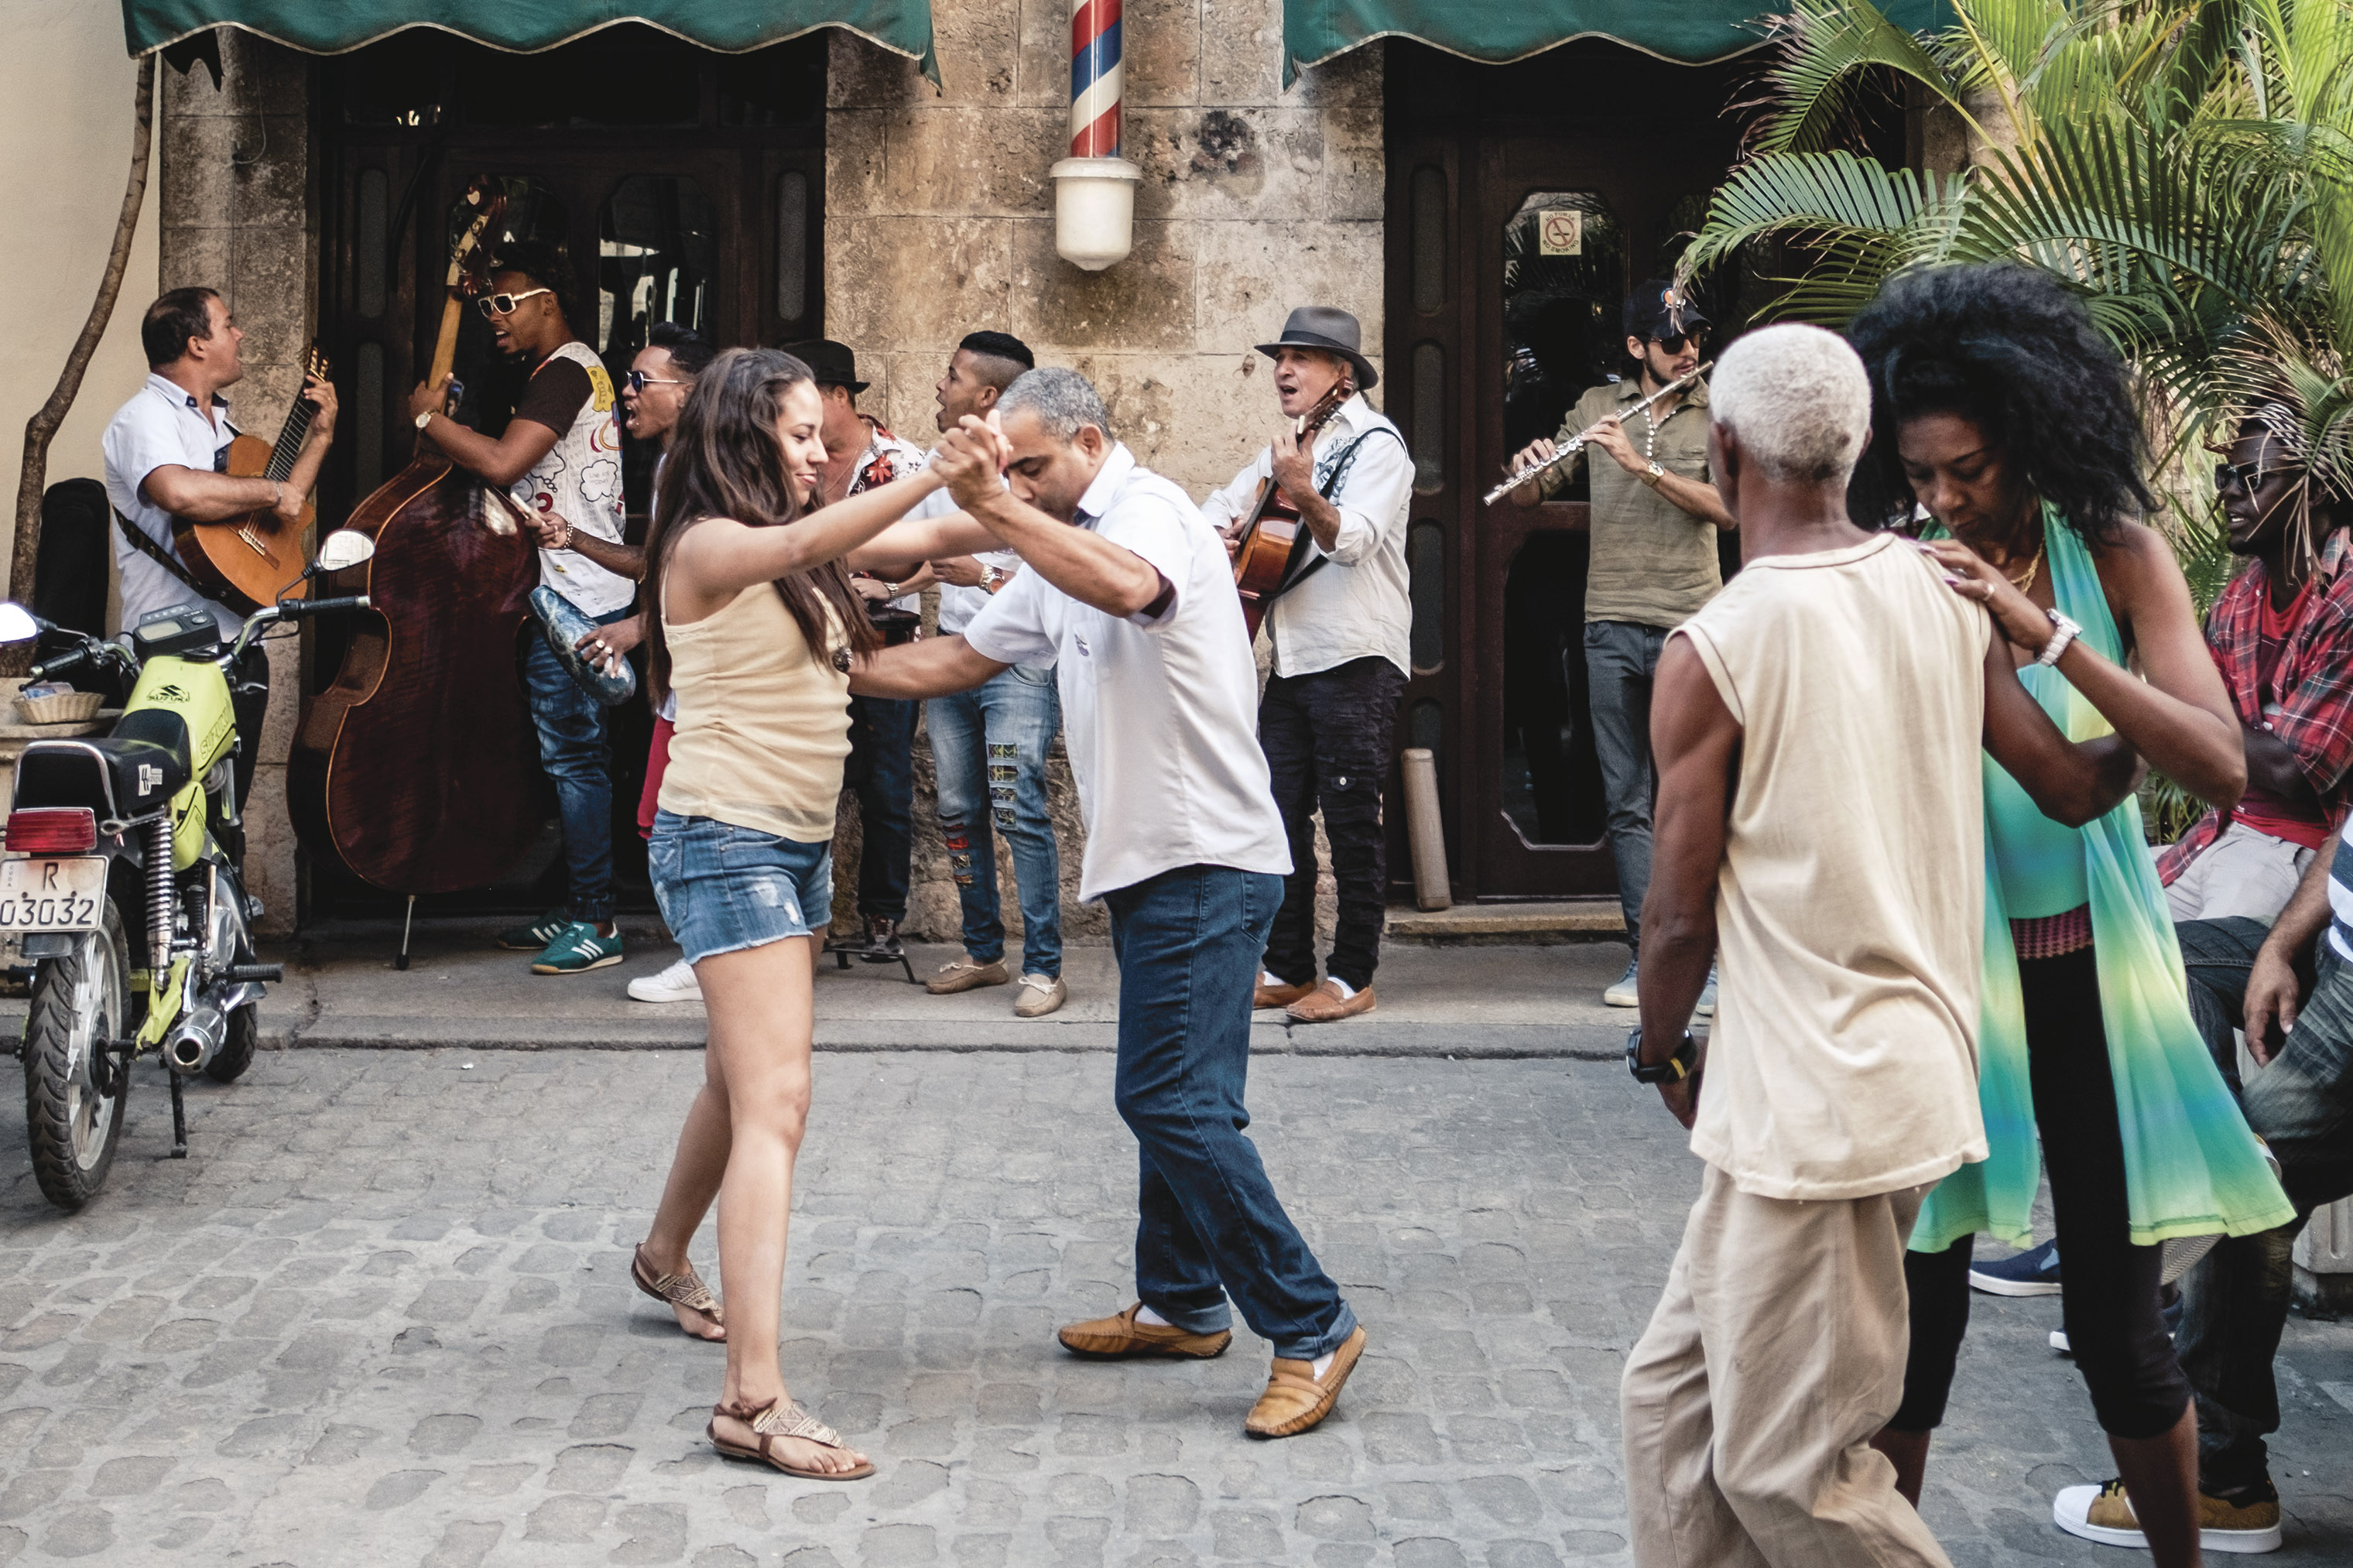 People dance in the streets of Old Havana.